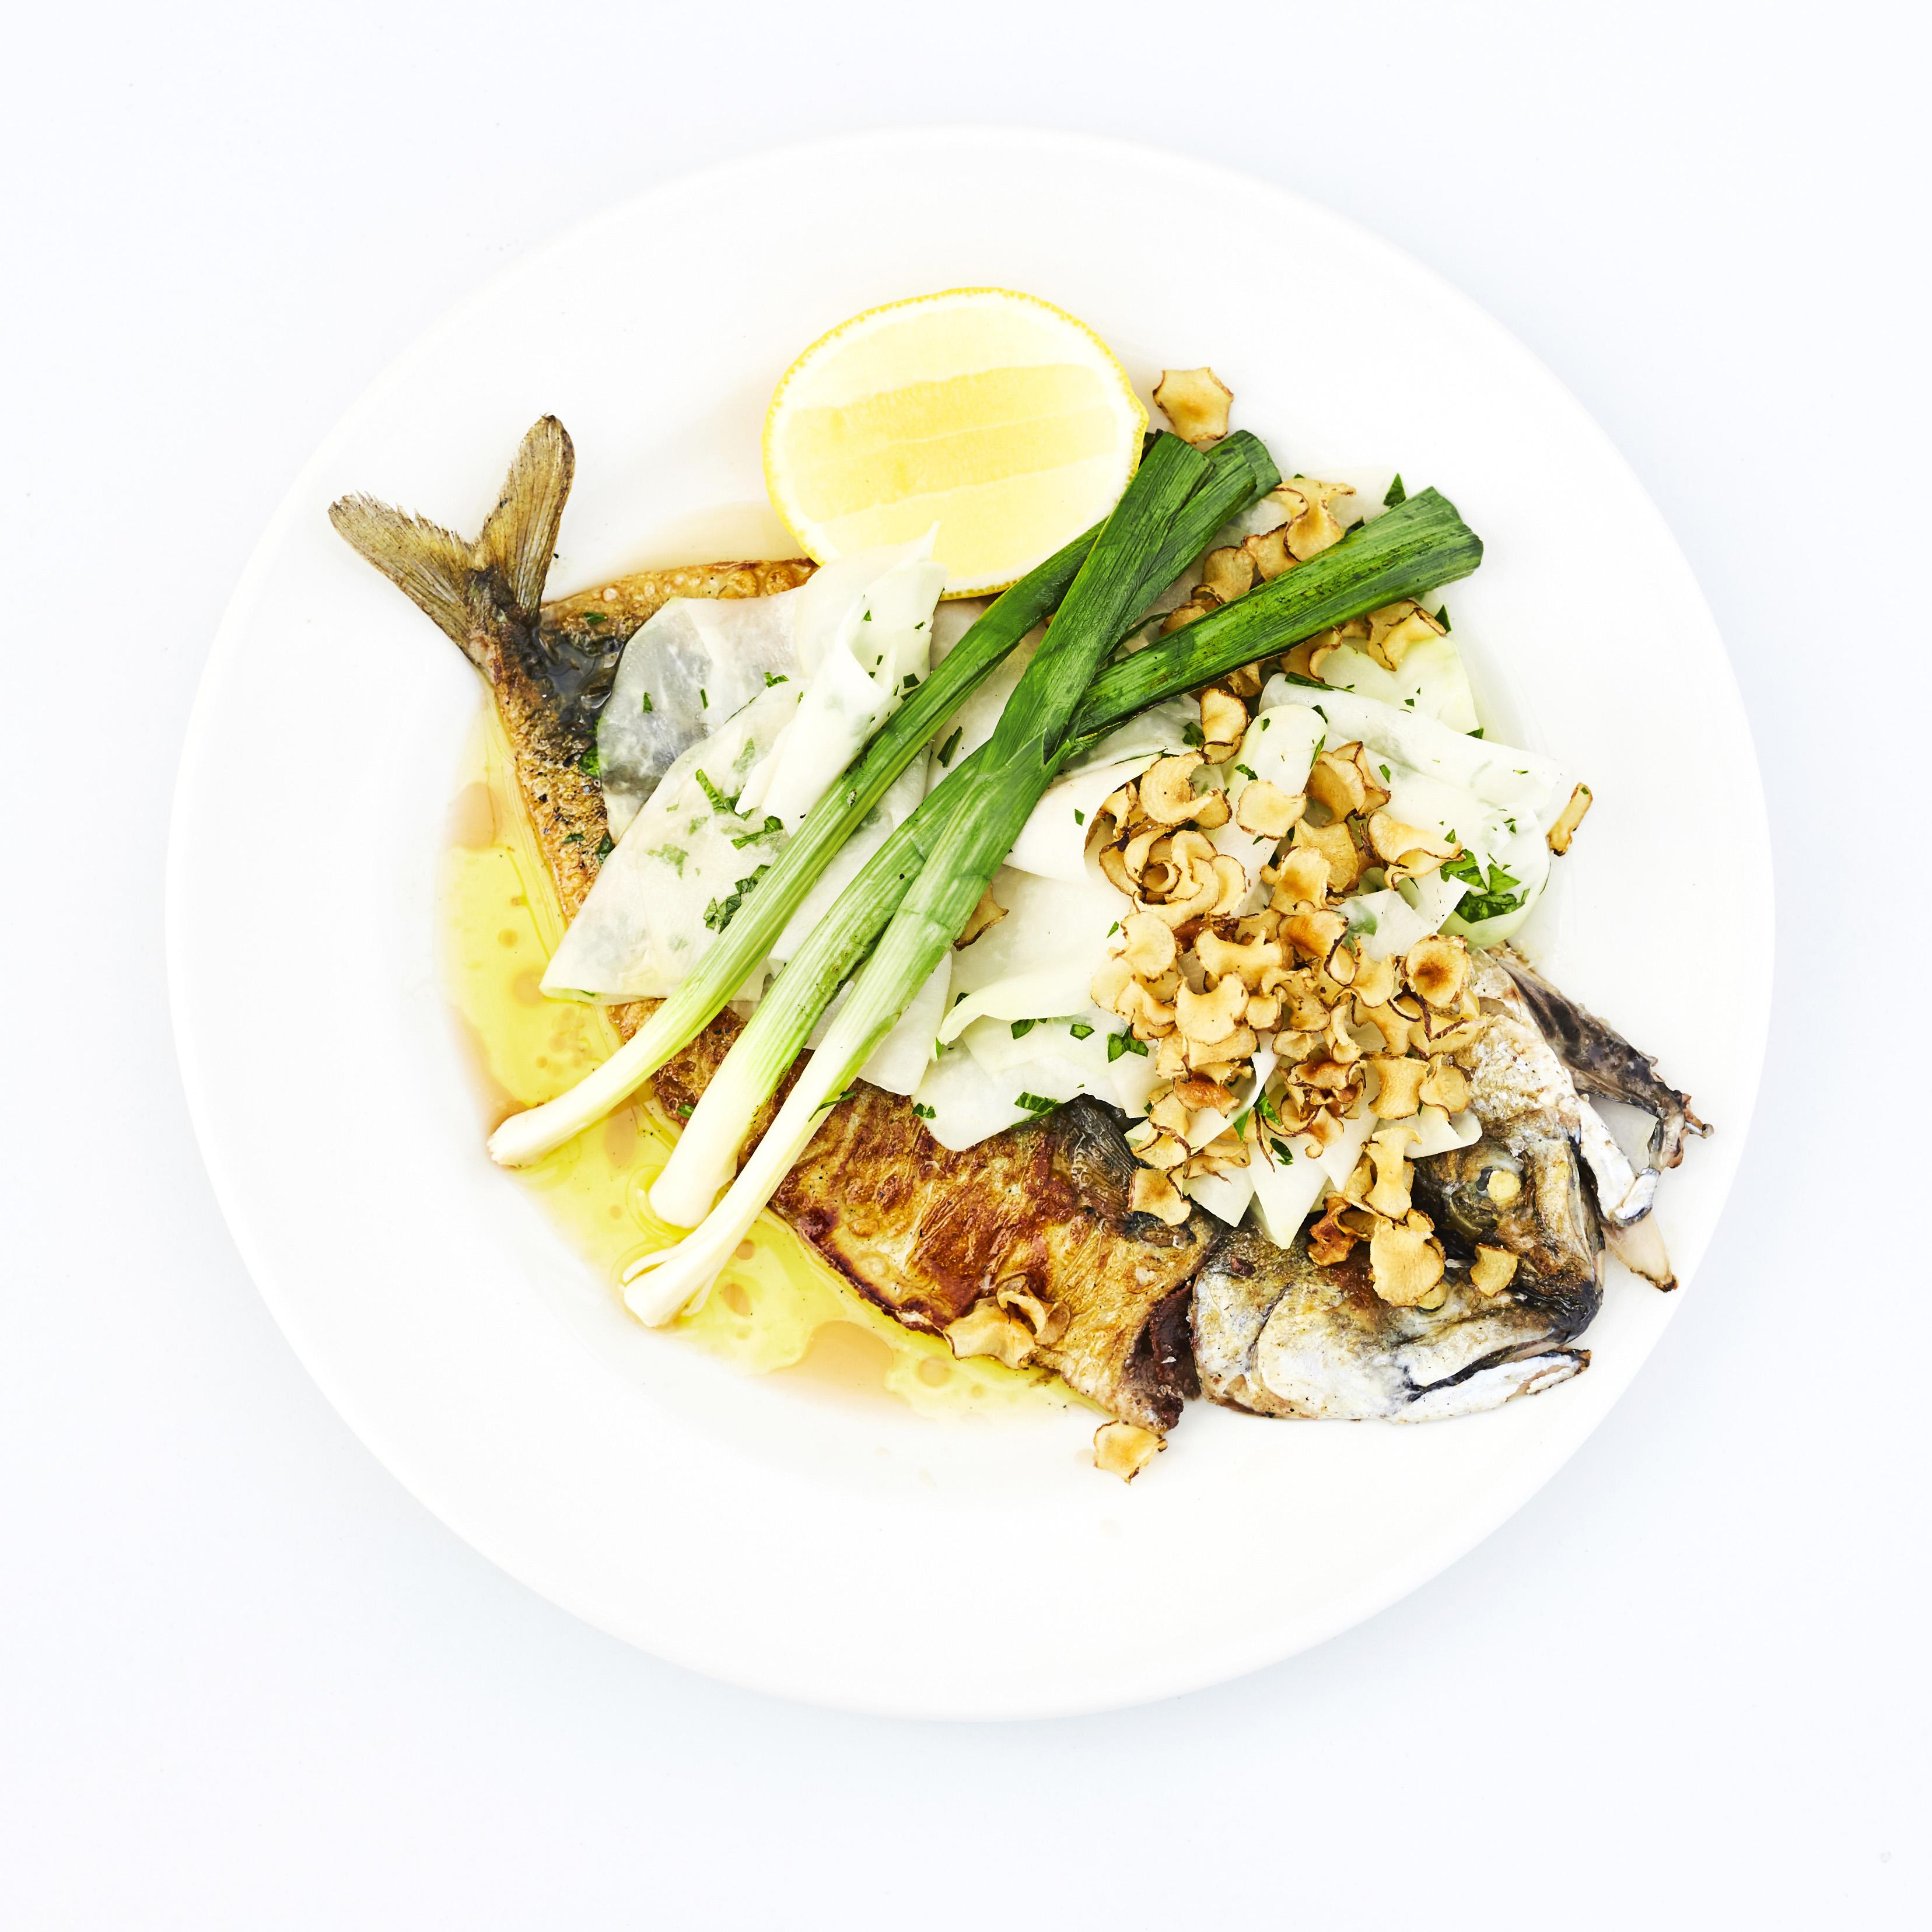 Whole roast mackerel leeks, kohlrabi, jerusalem artichokes from Xiringuito, liverpool